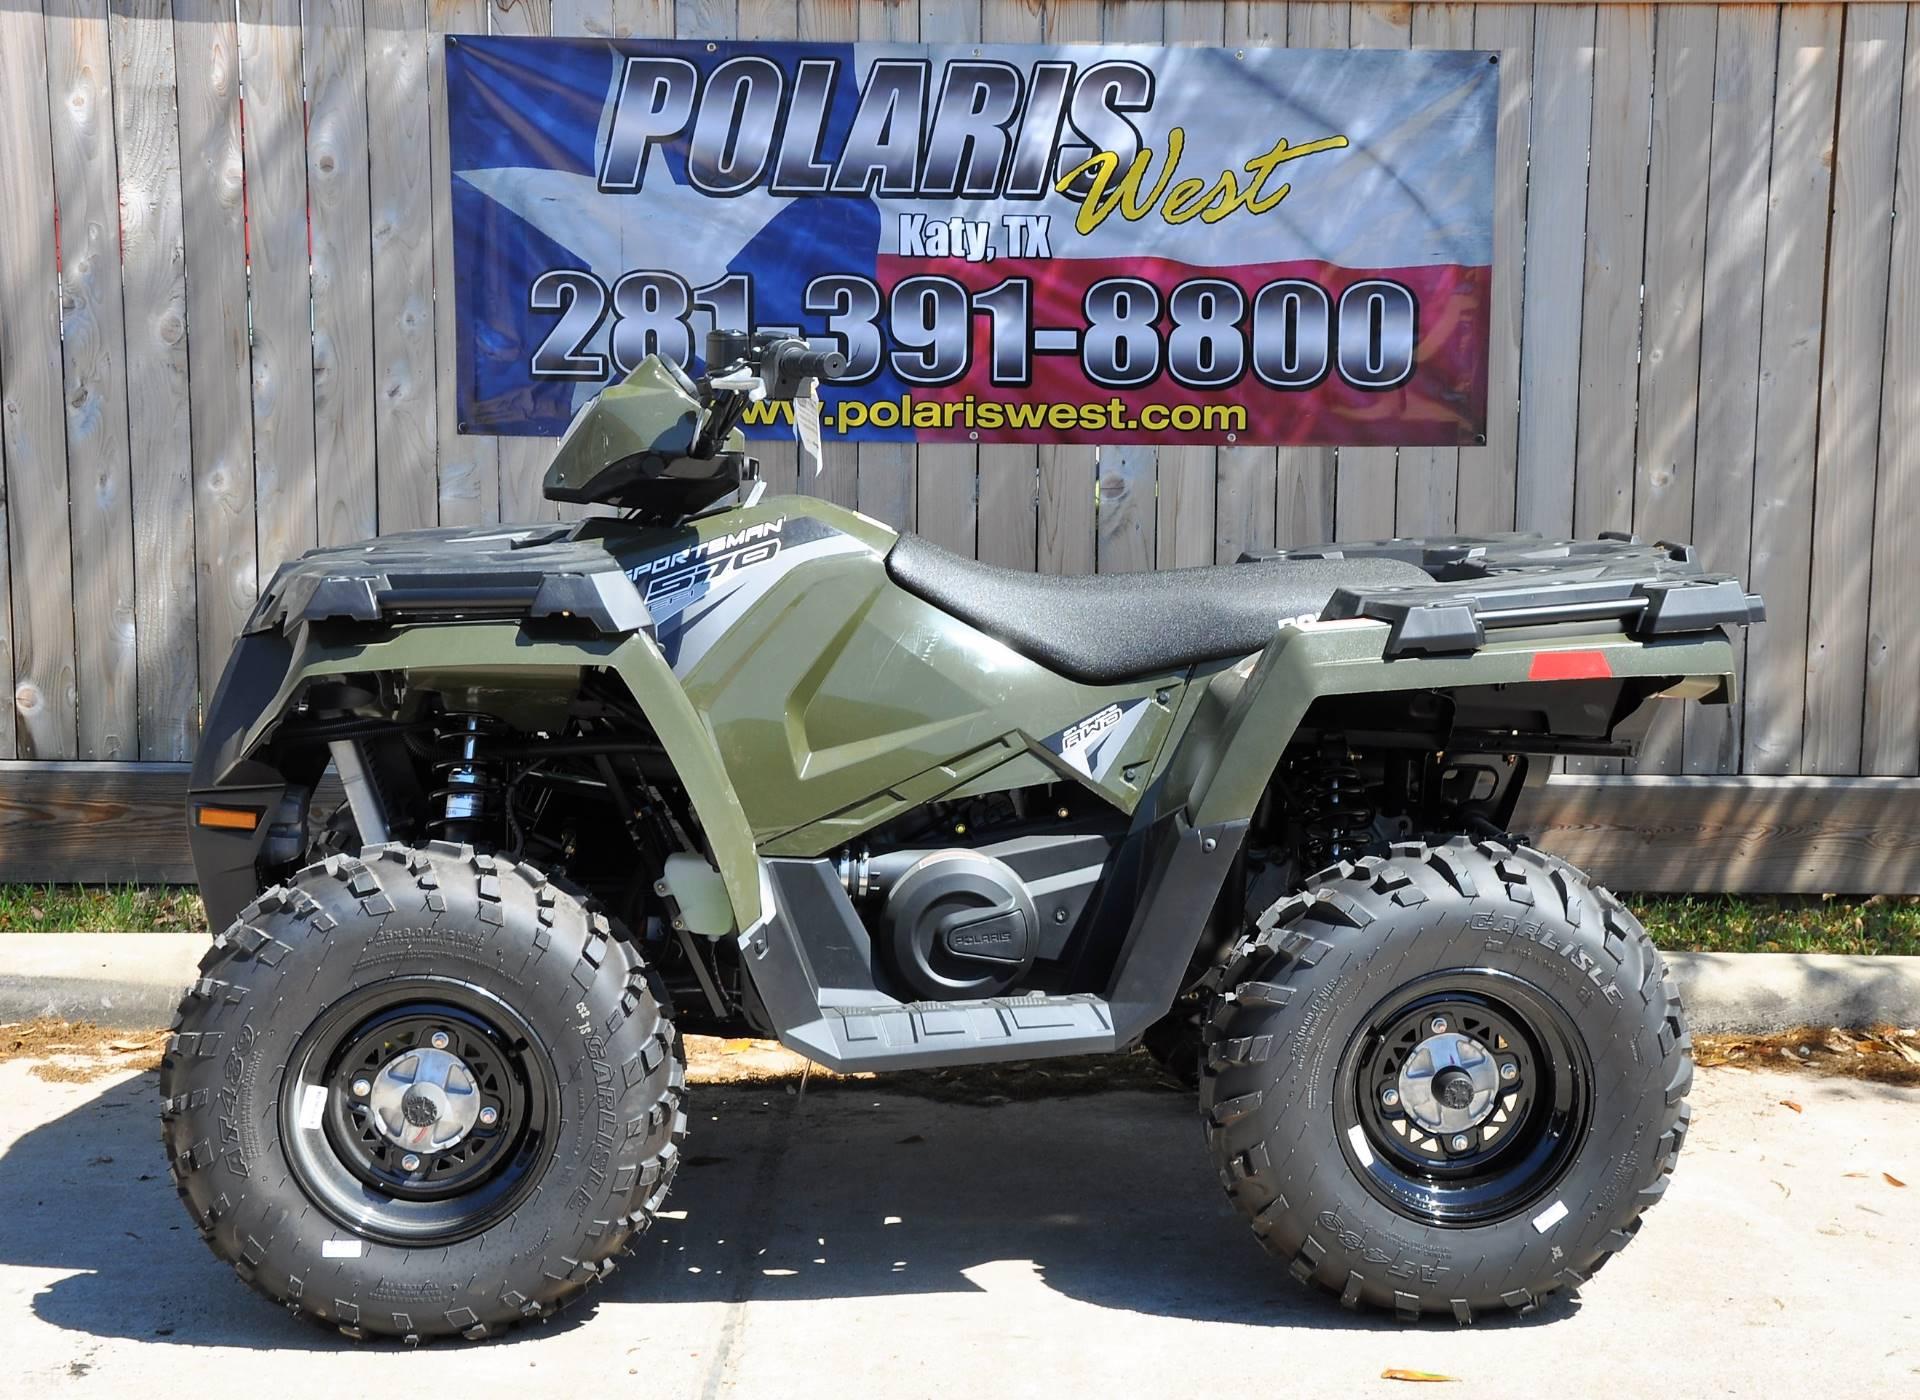 New 2018 Polaris Sportsman 570 ATVs in Katy, TX   Stock Number ...